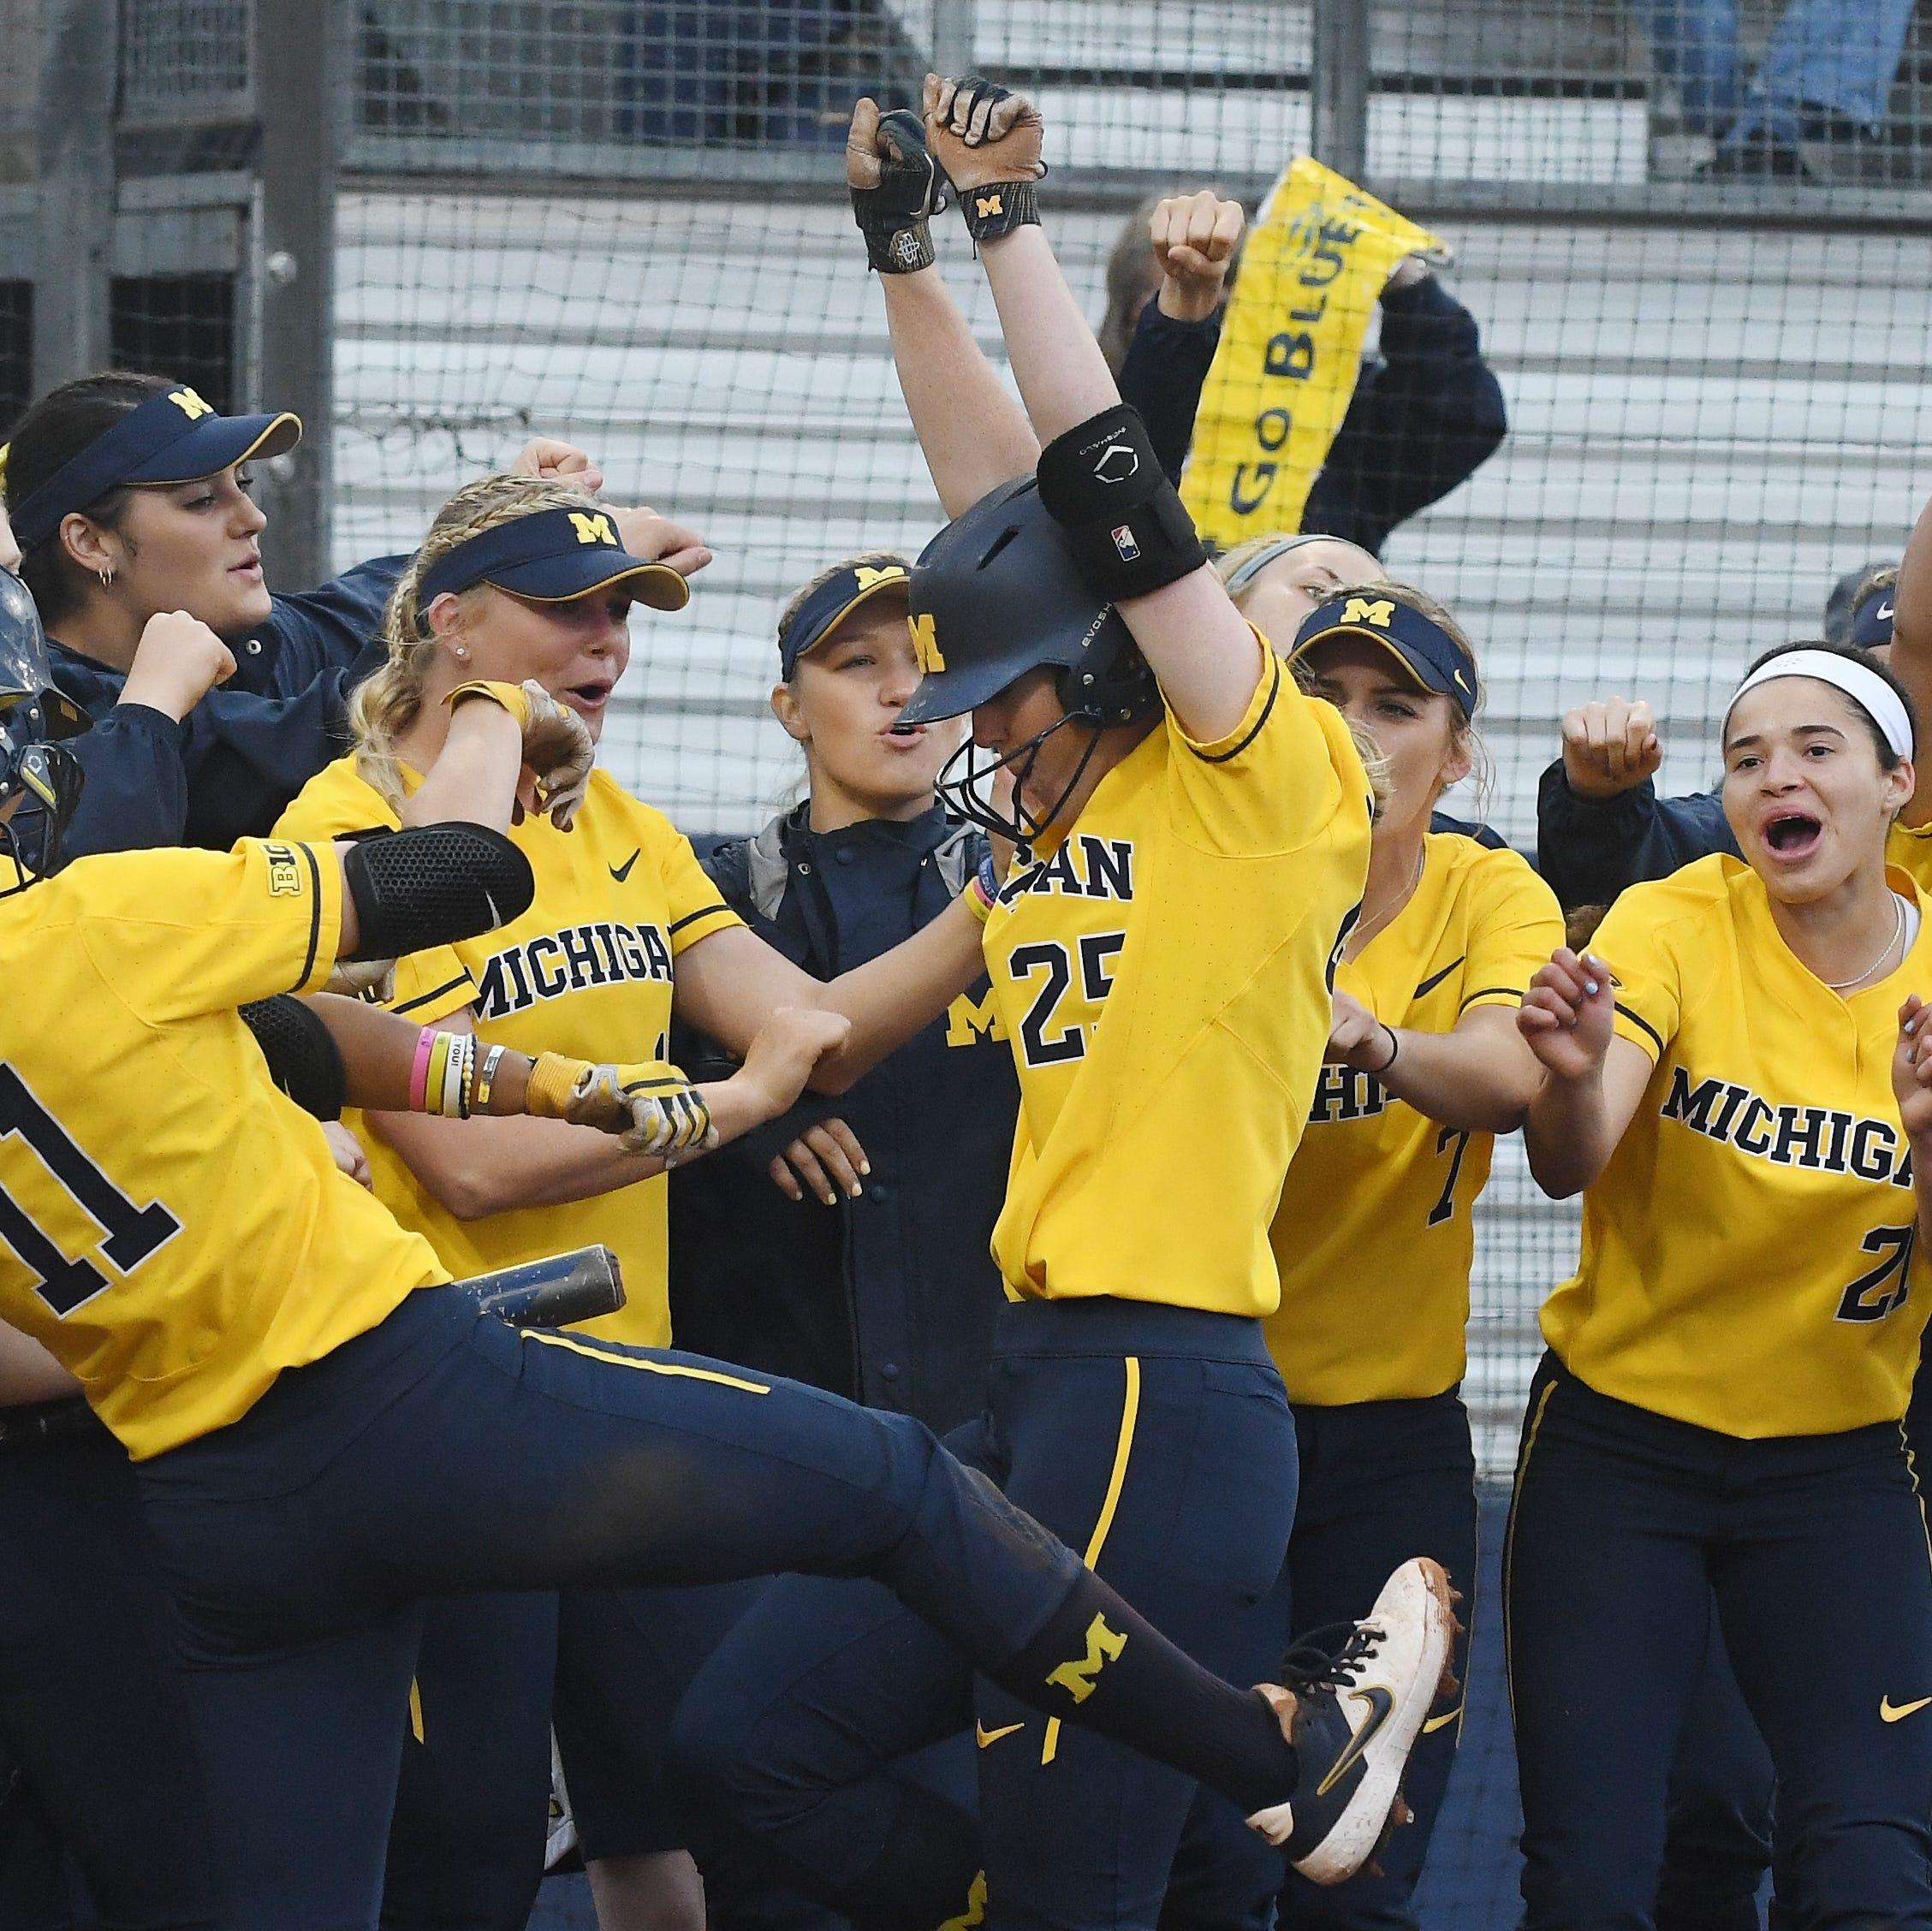 Michigan softball rolls in regional opener, 'great battle' awaits